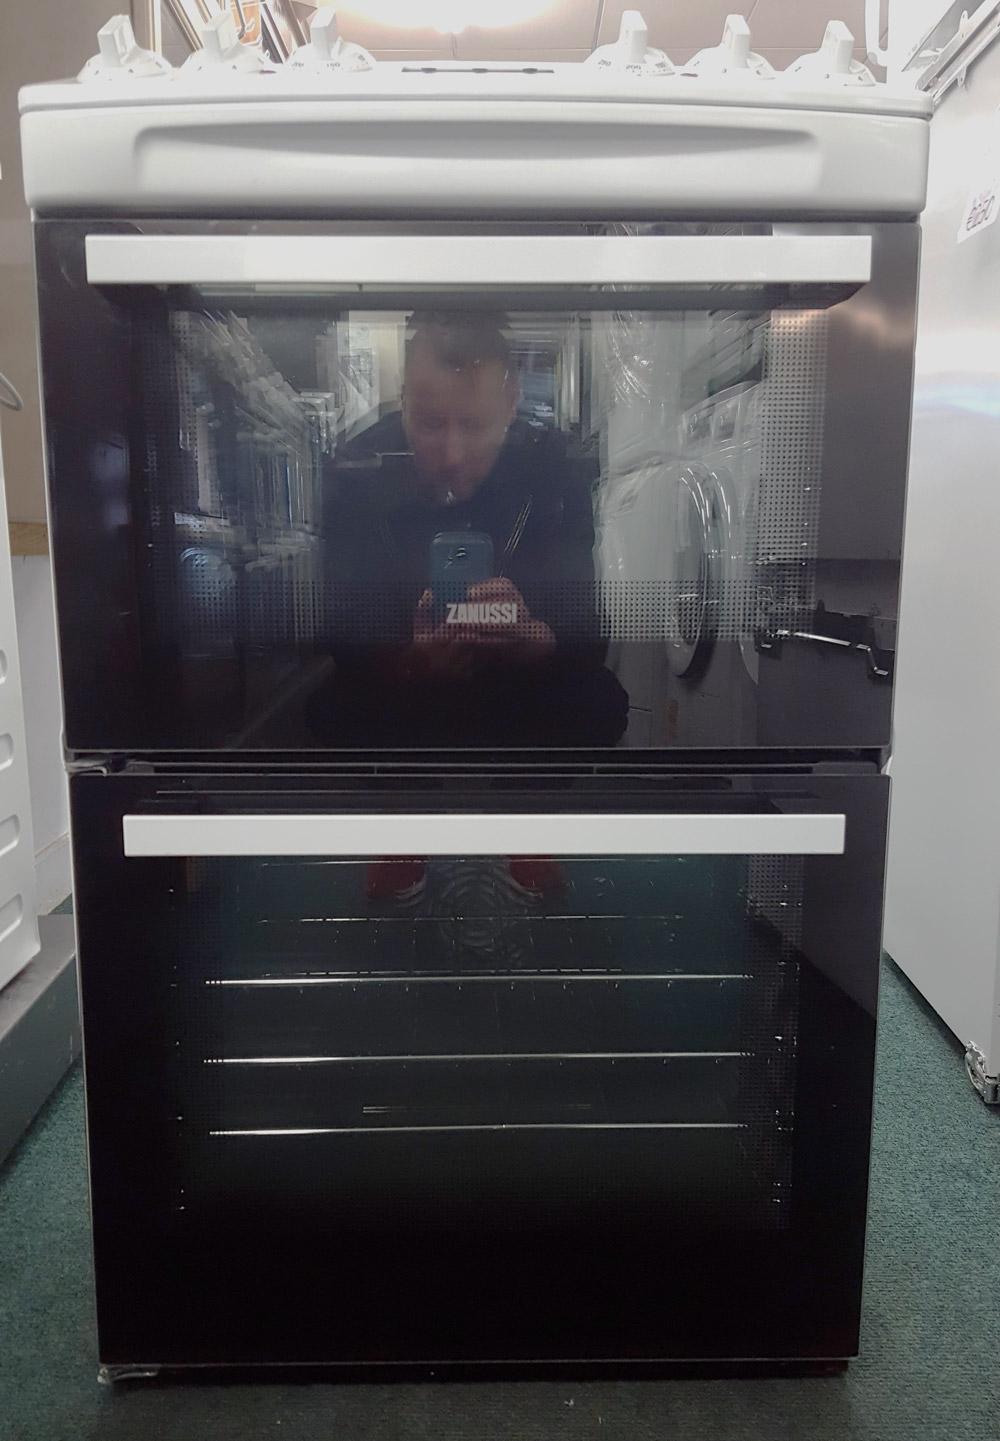 "alt=""Zanussi ZCV46250WA cooker full view"""